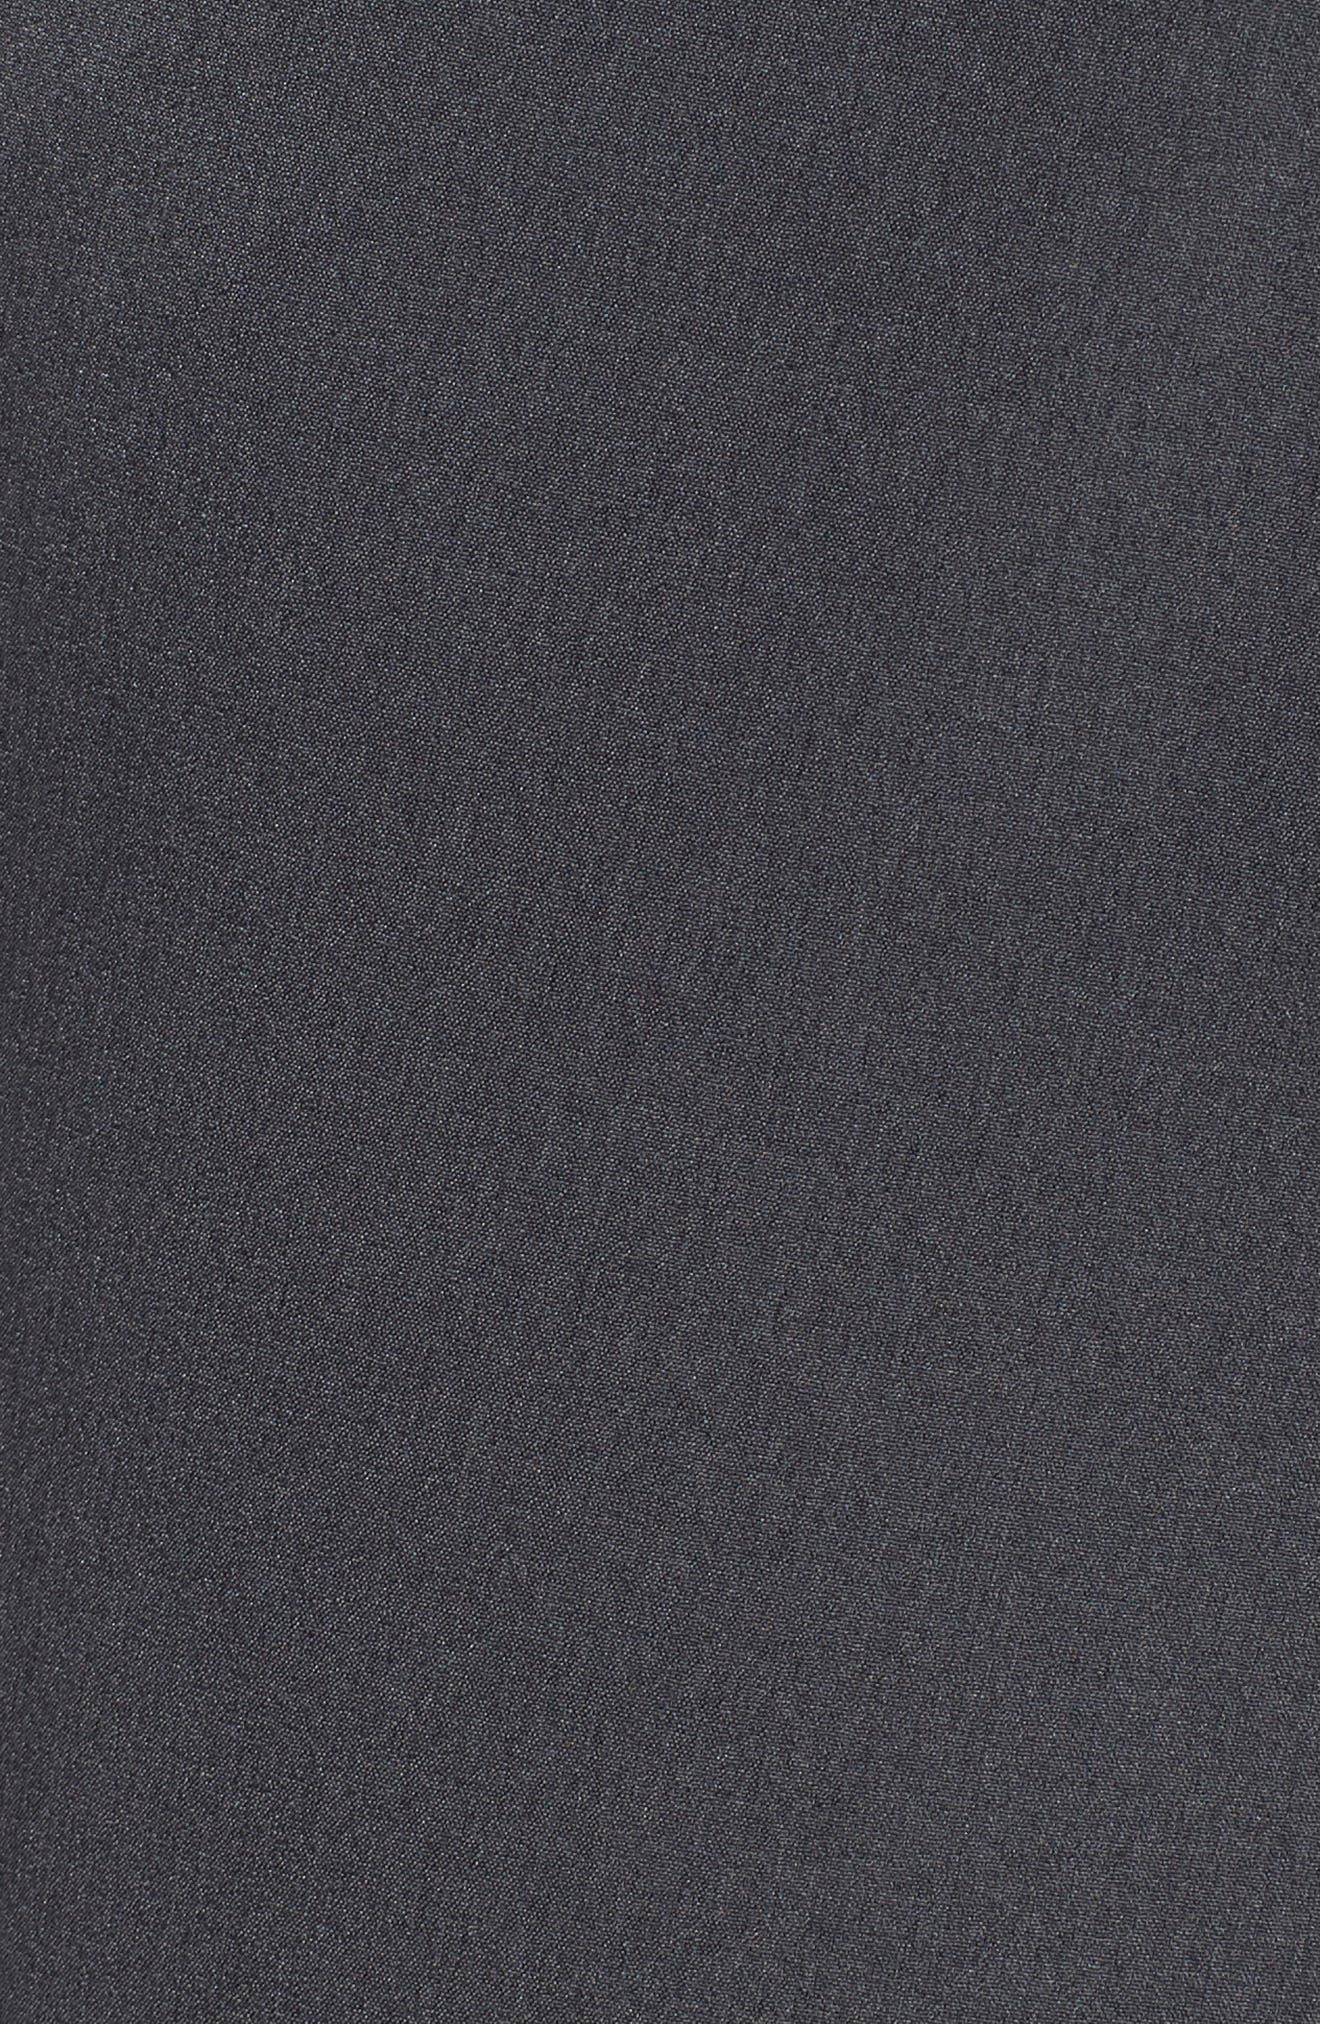 Hybrid Flex Golf Pants,                             Alternate thumbnail 5, color,                             CHARCOAL HEATHER/ DARK GREY